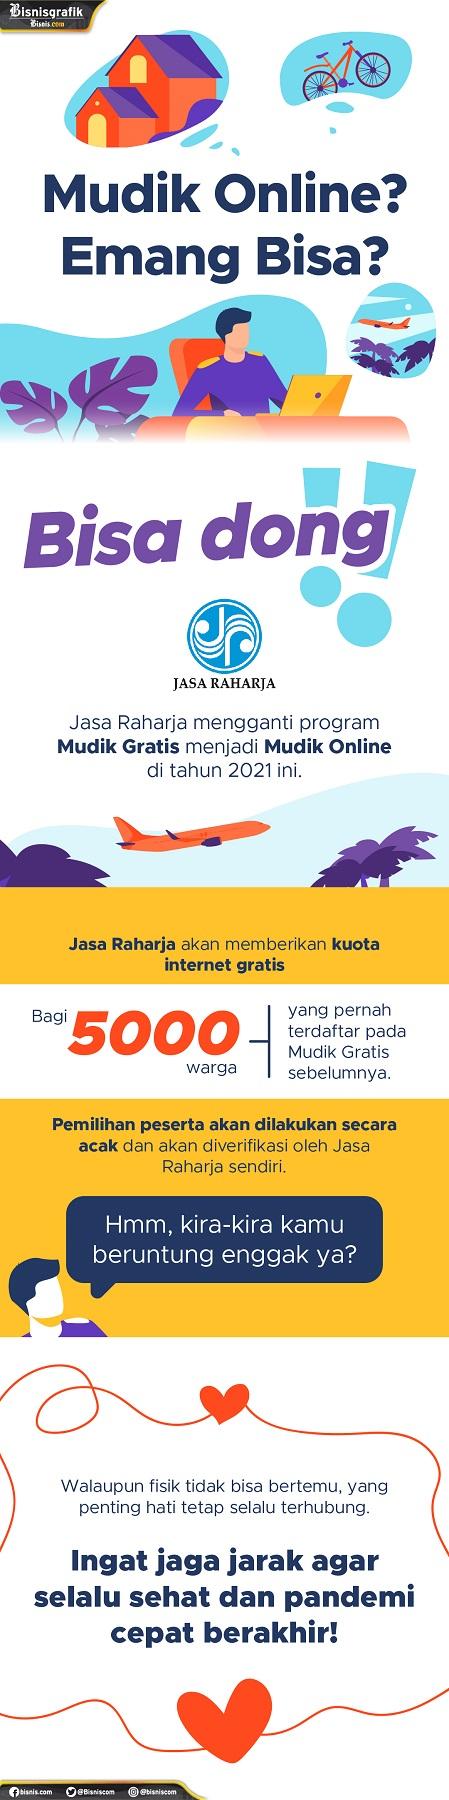 Gambar: Infografis Mudik Online